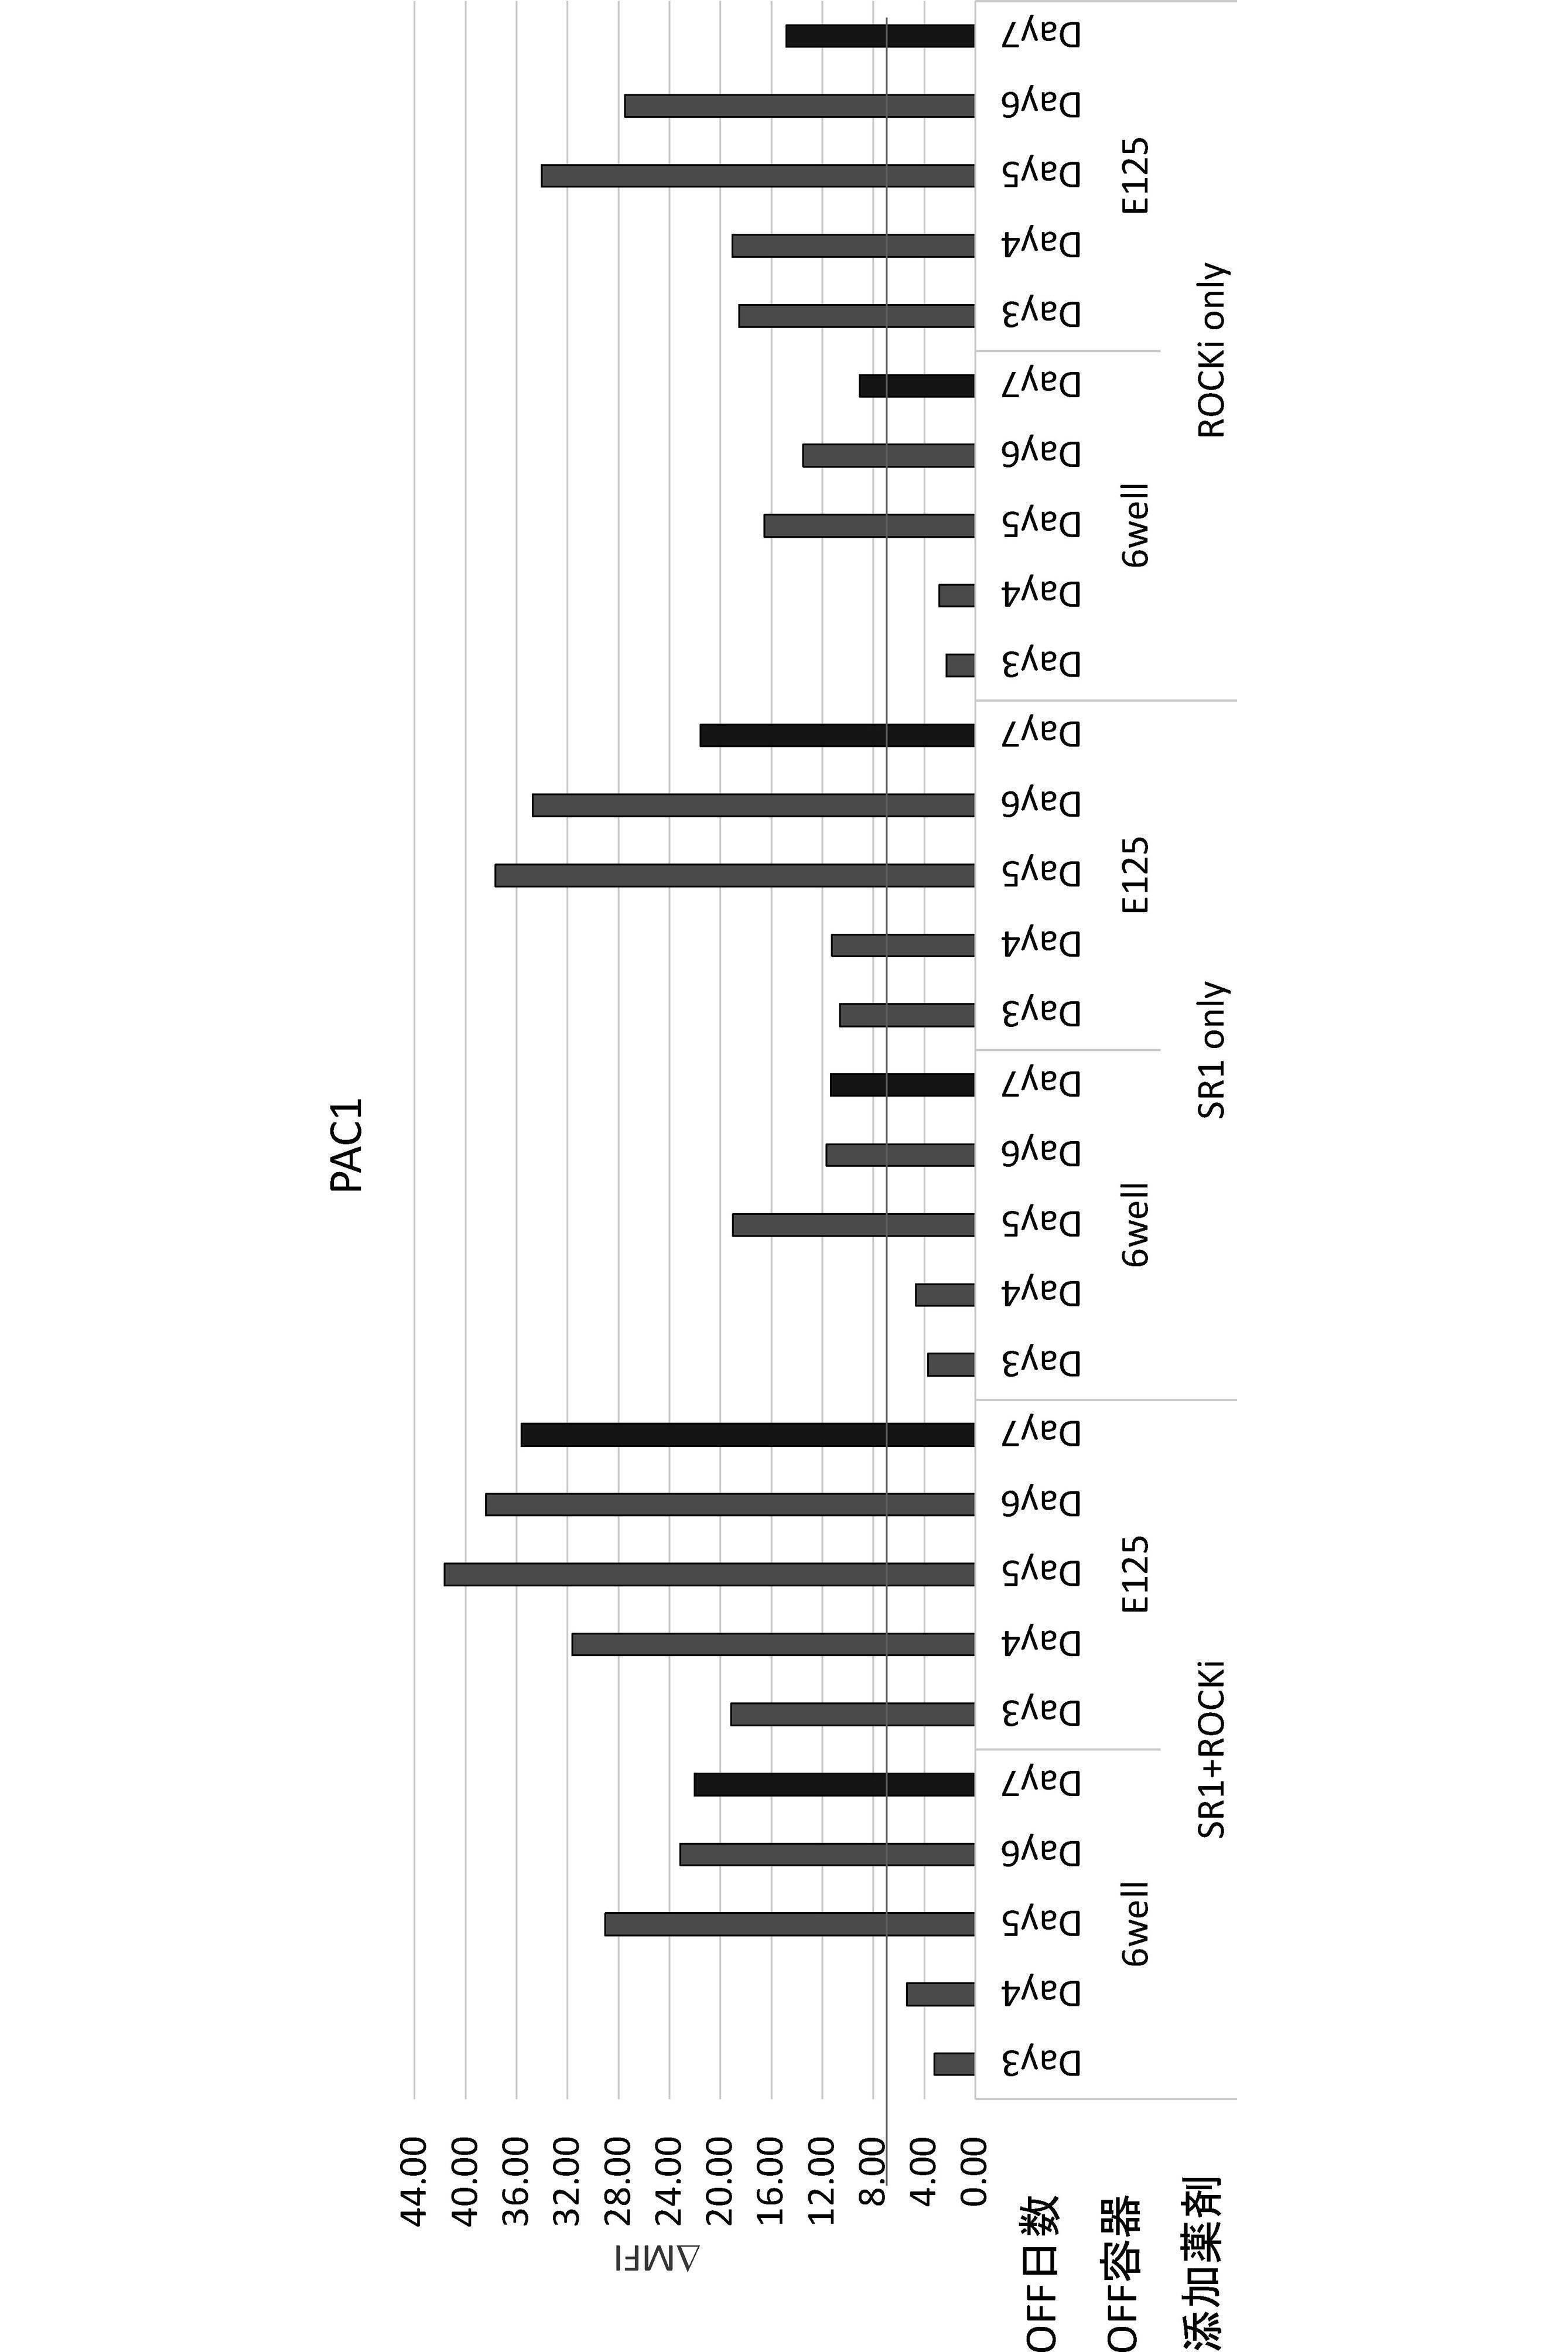 WO2016204256A1 - 高機能性血小板の製造方法 - Google Patents